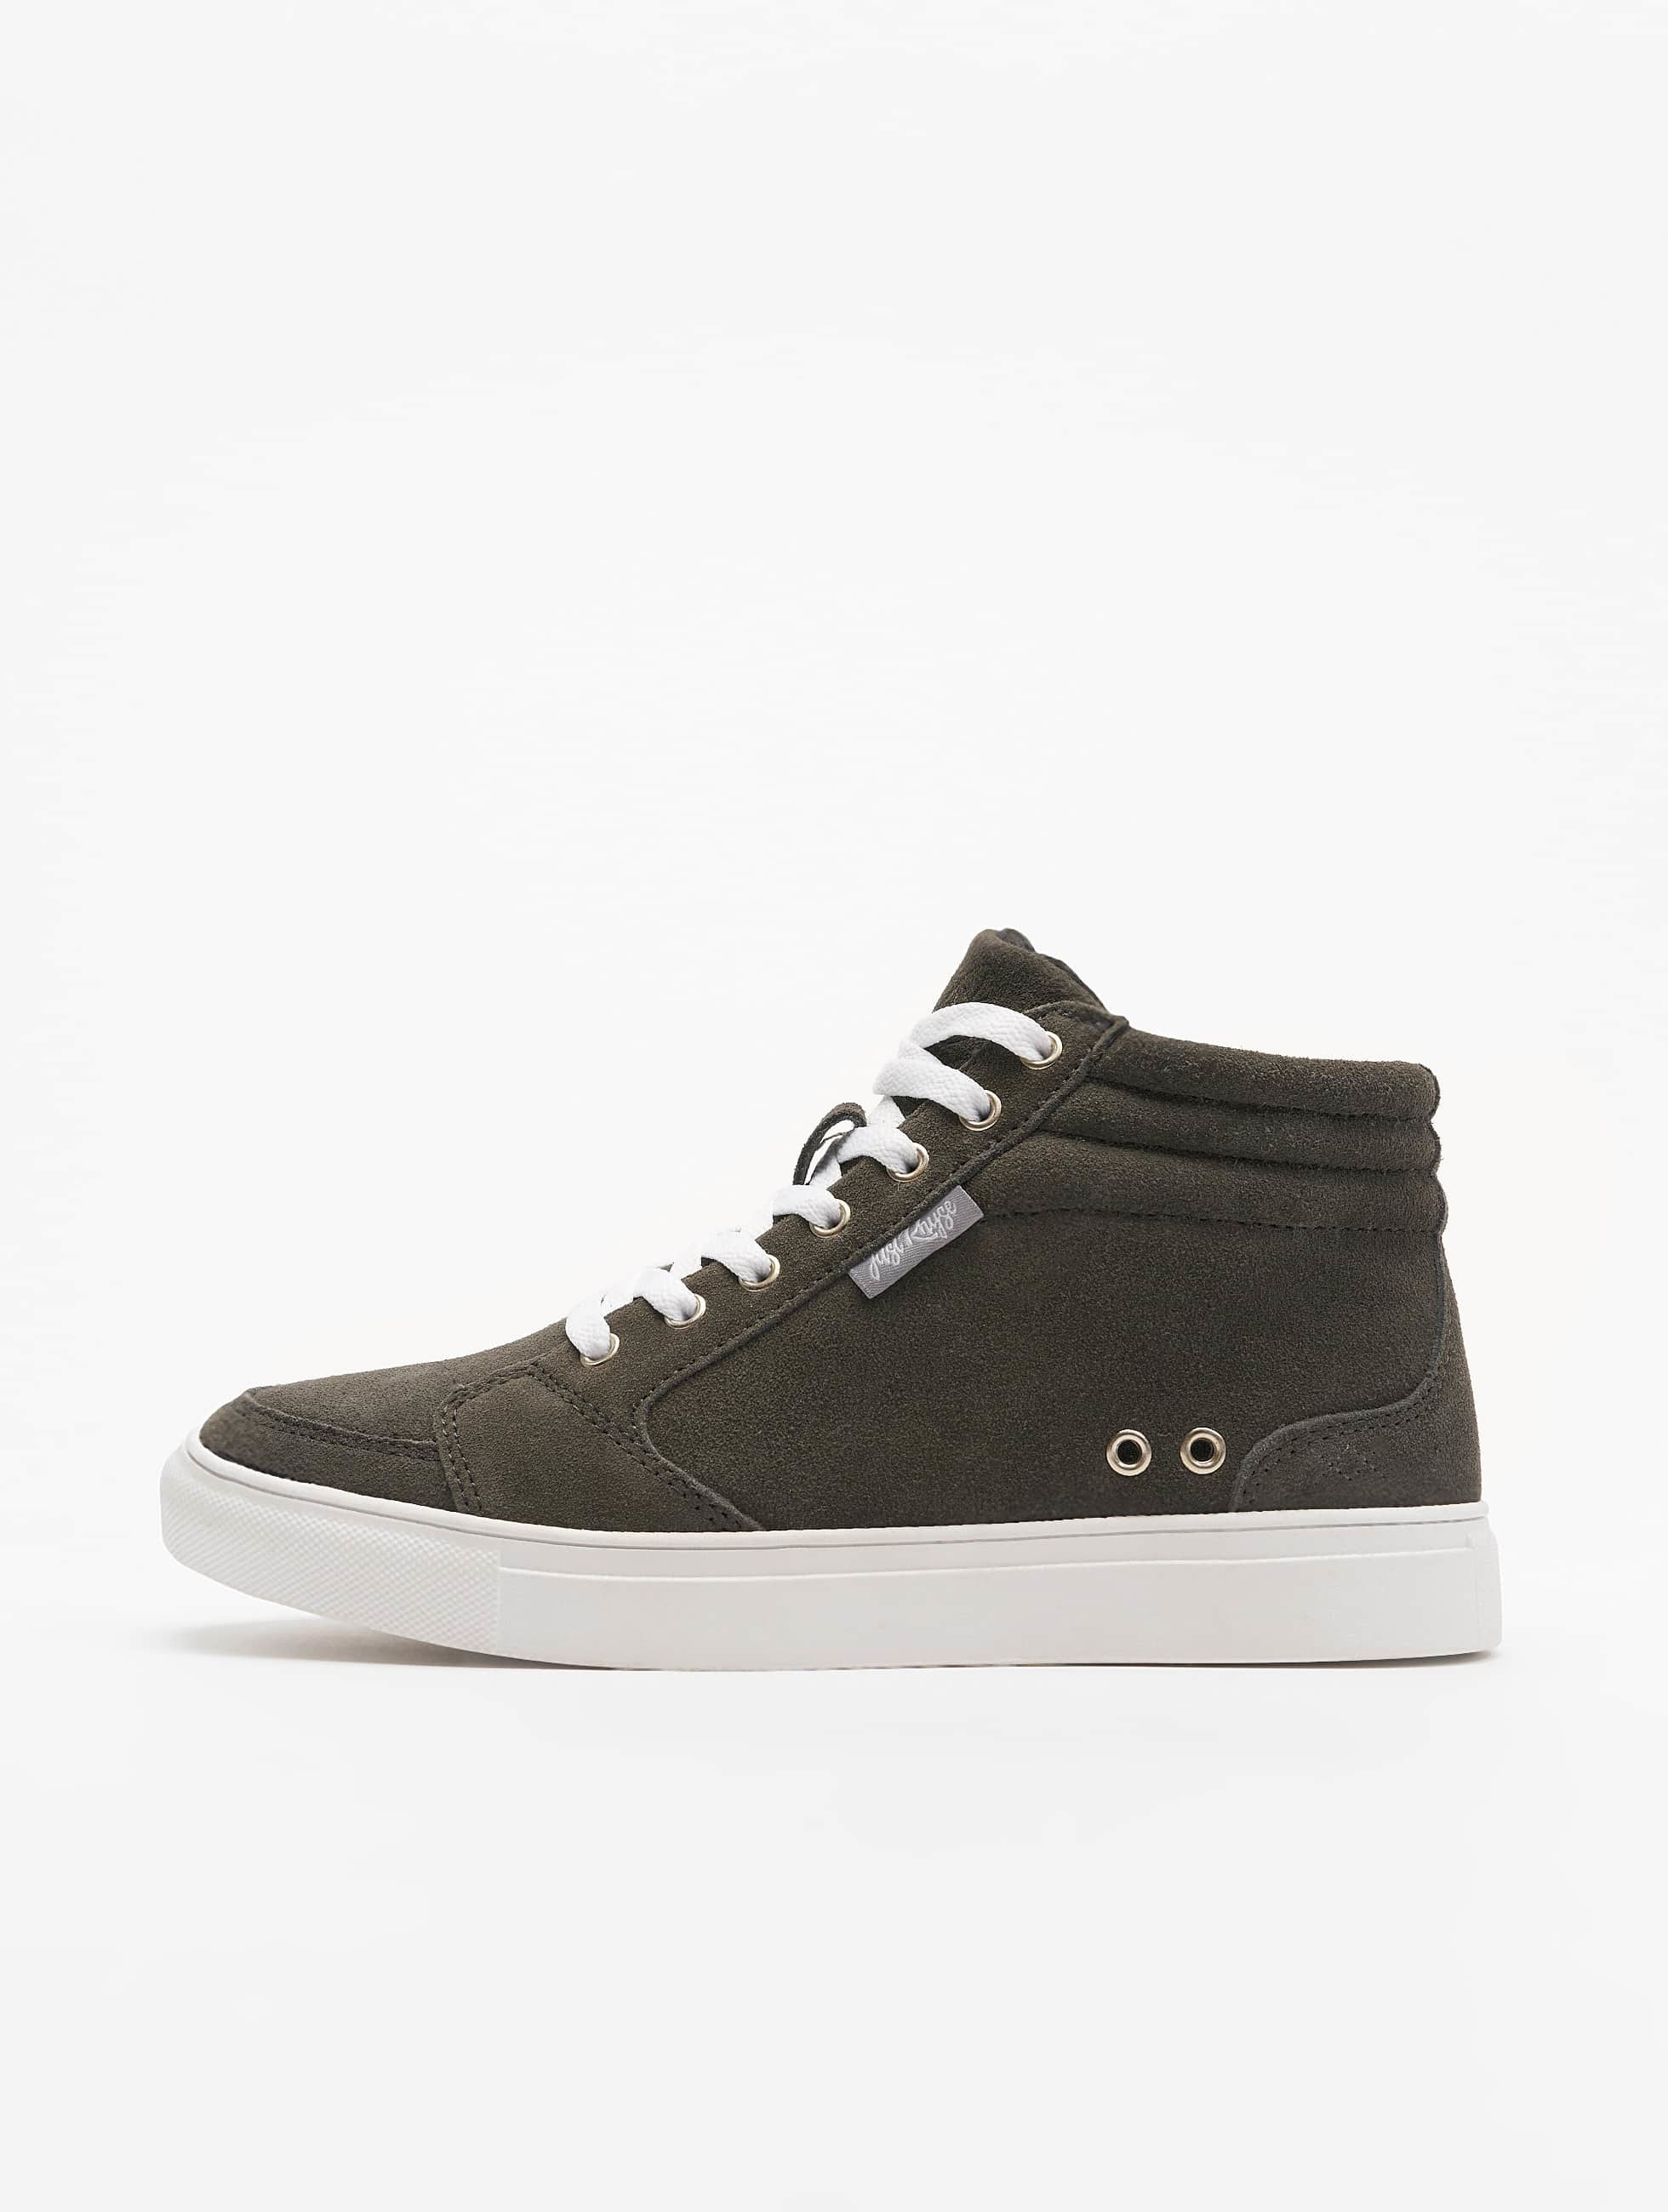 Just Rhyse / Sneakers Ghettostars in grey 43